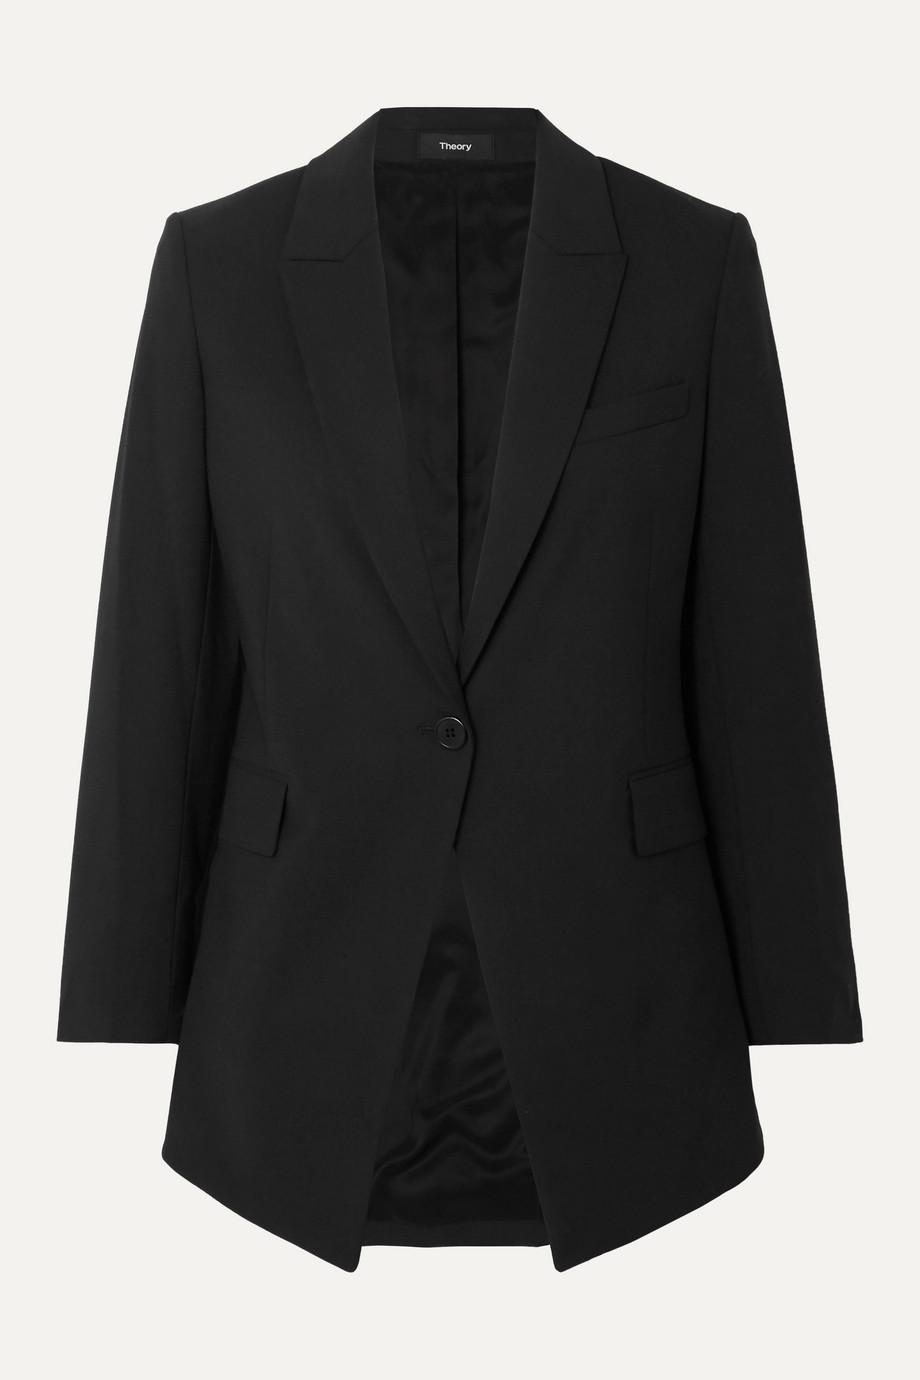 Theory Etiennette wool-blend crepe blazer